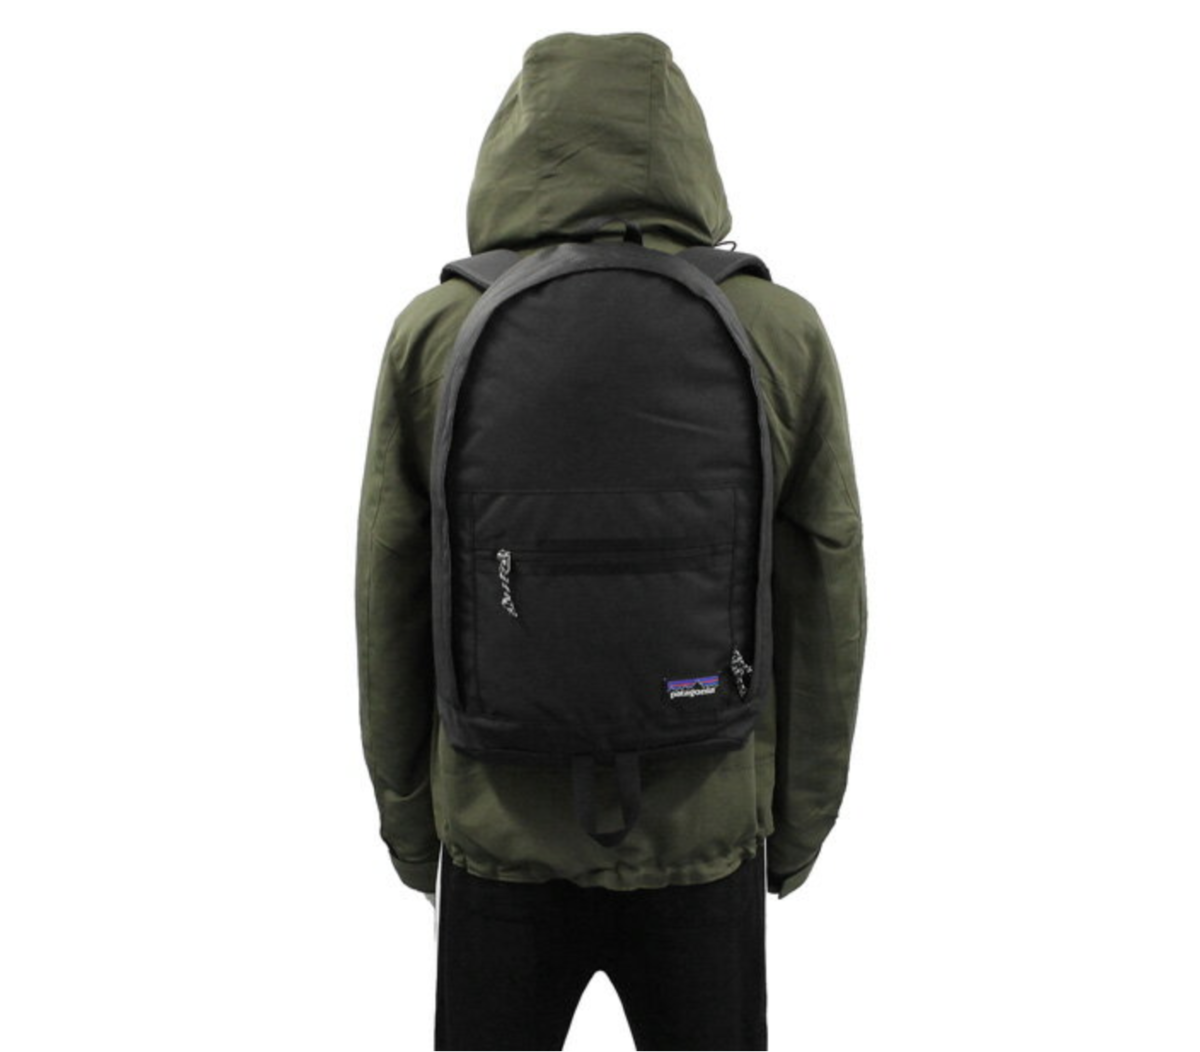 f:id:thebackpack:20190717200322p:plain